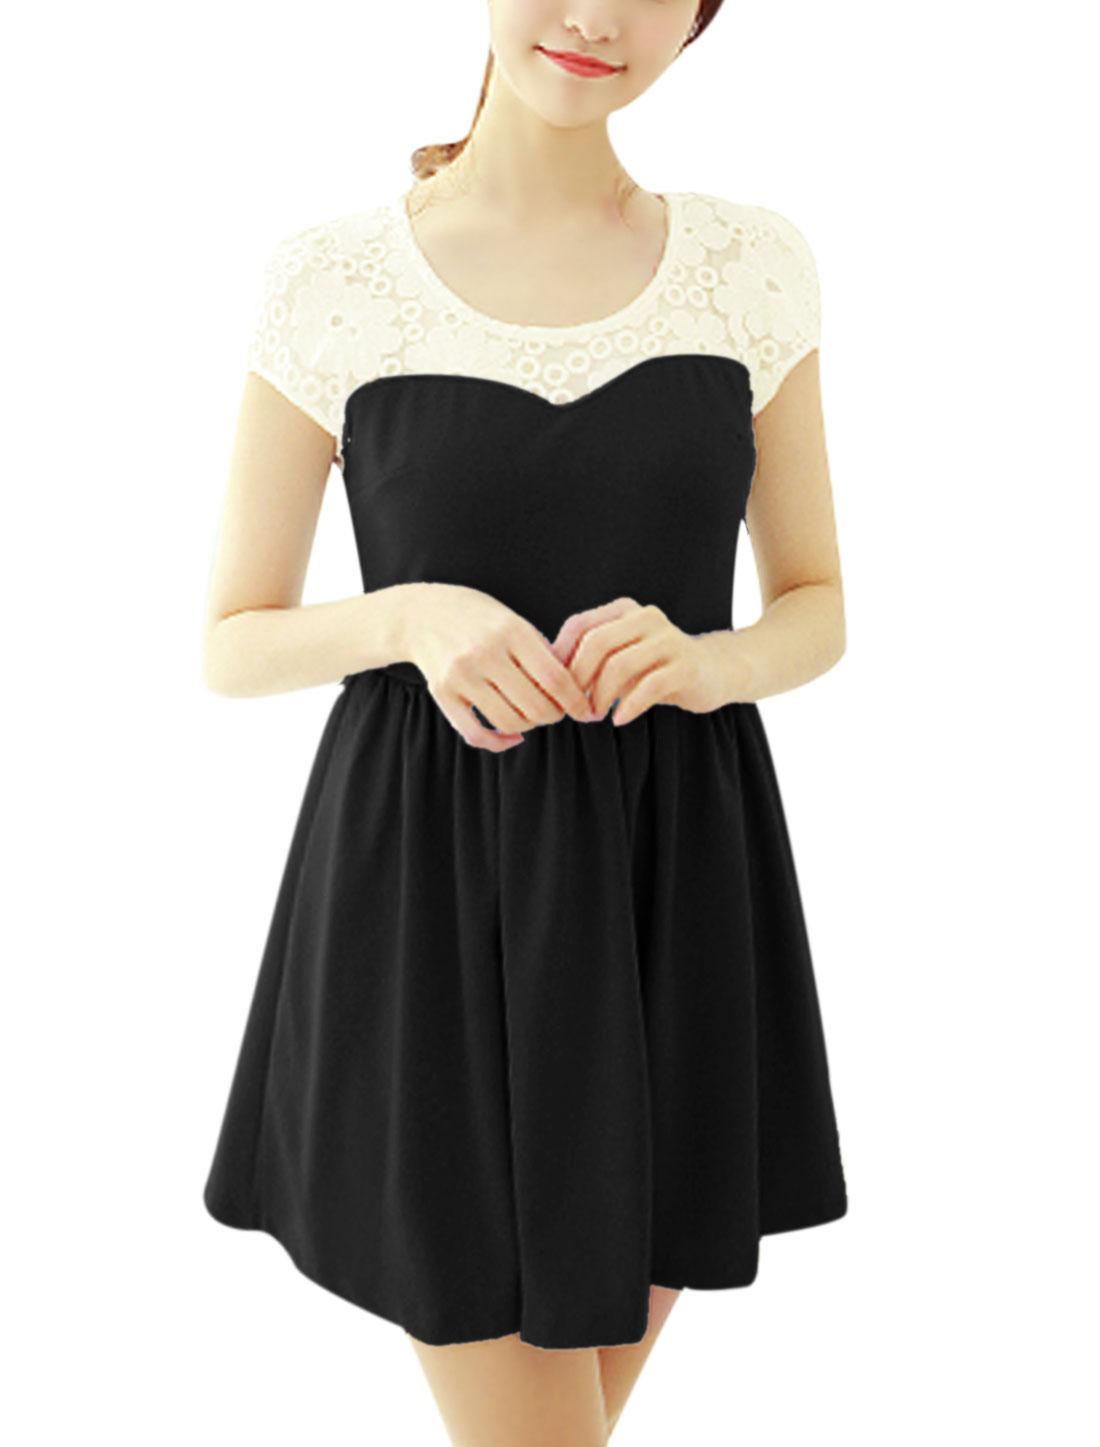 Ladies Flower Embroidery Mesh Panel Semi Sheer Yoke Mini Dress Black XS